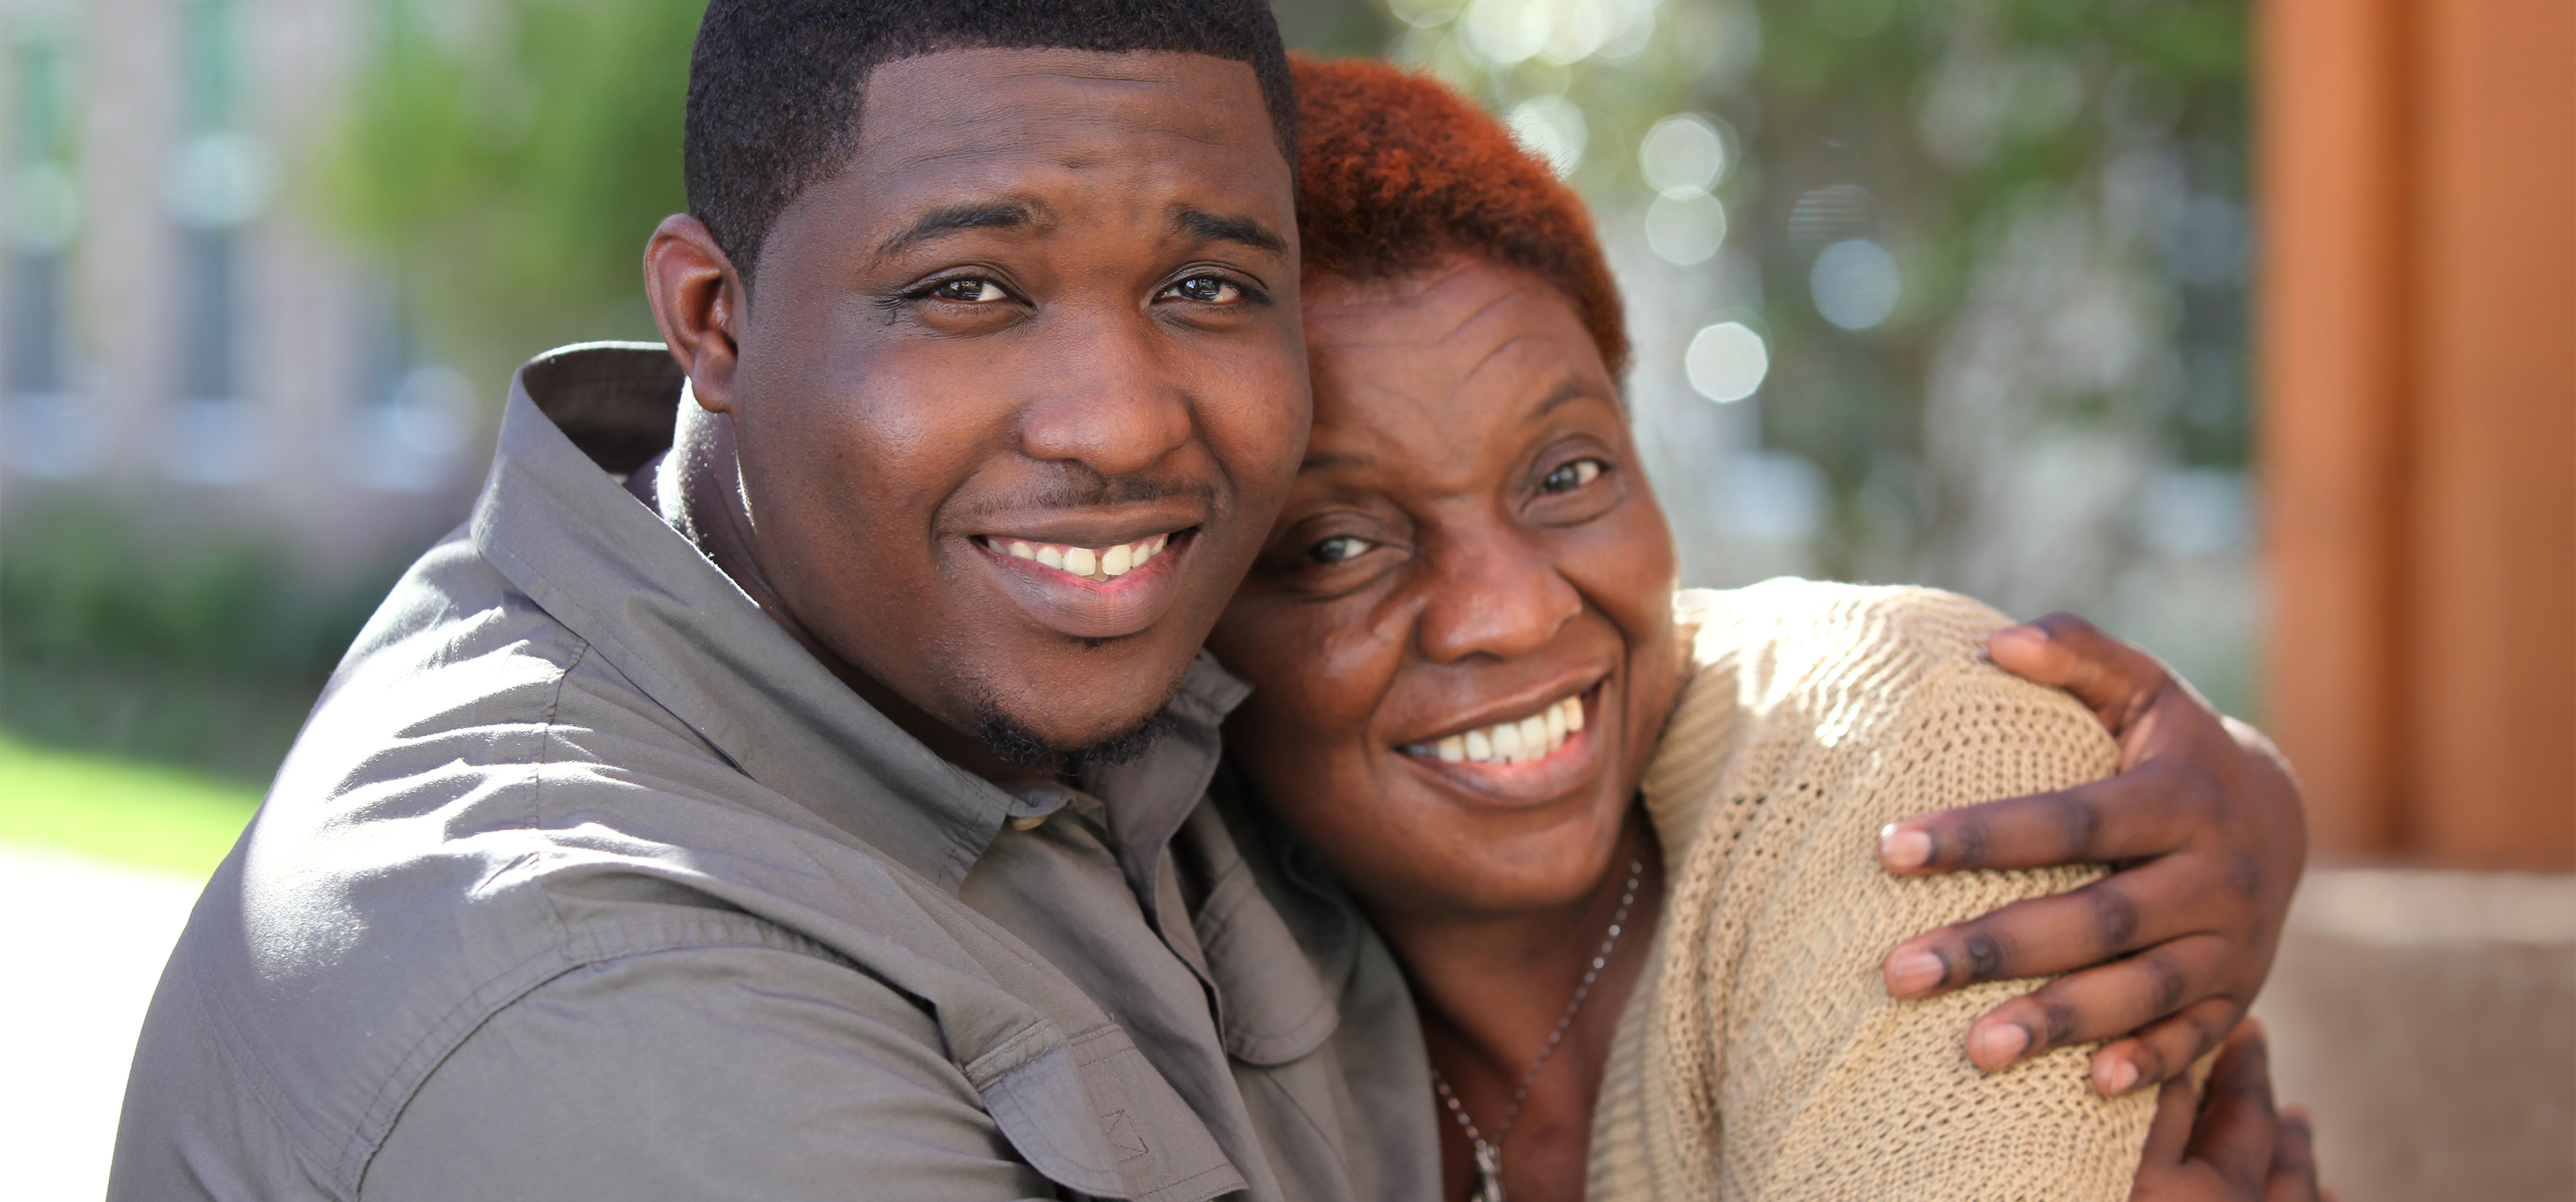 Man hugging his mom